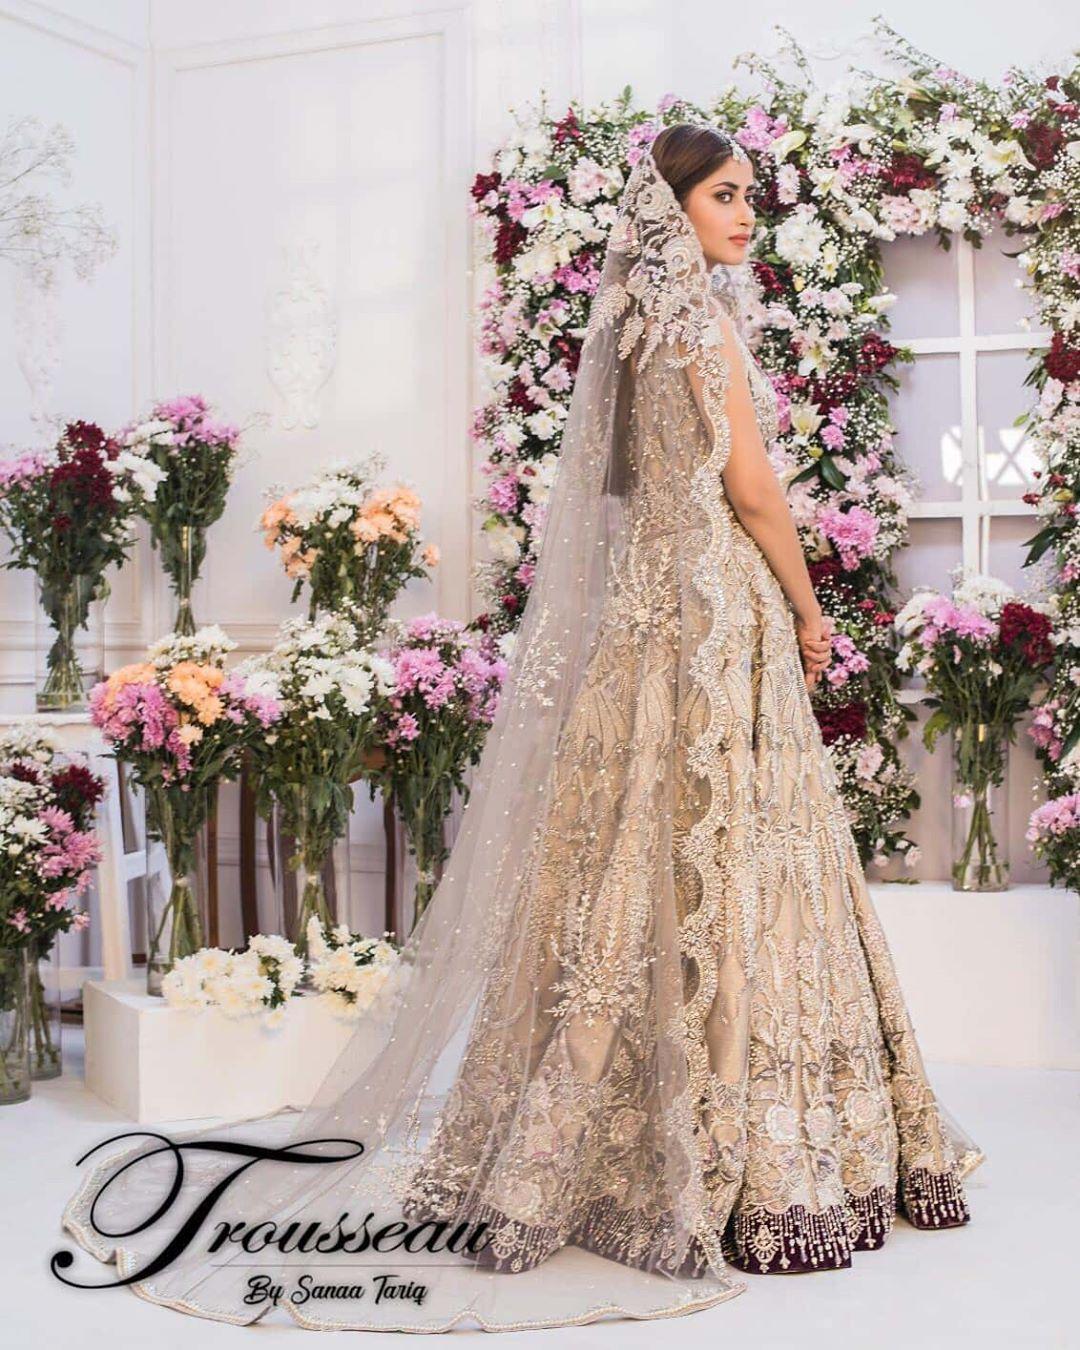 Sajal Aly Awesome New Bridal Photoshoot